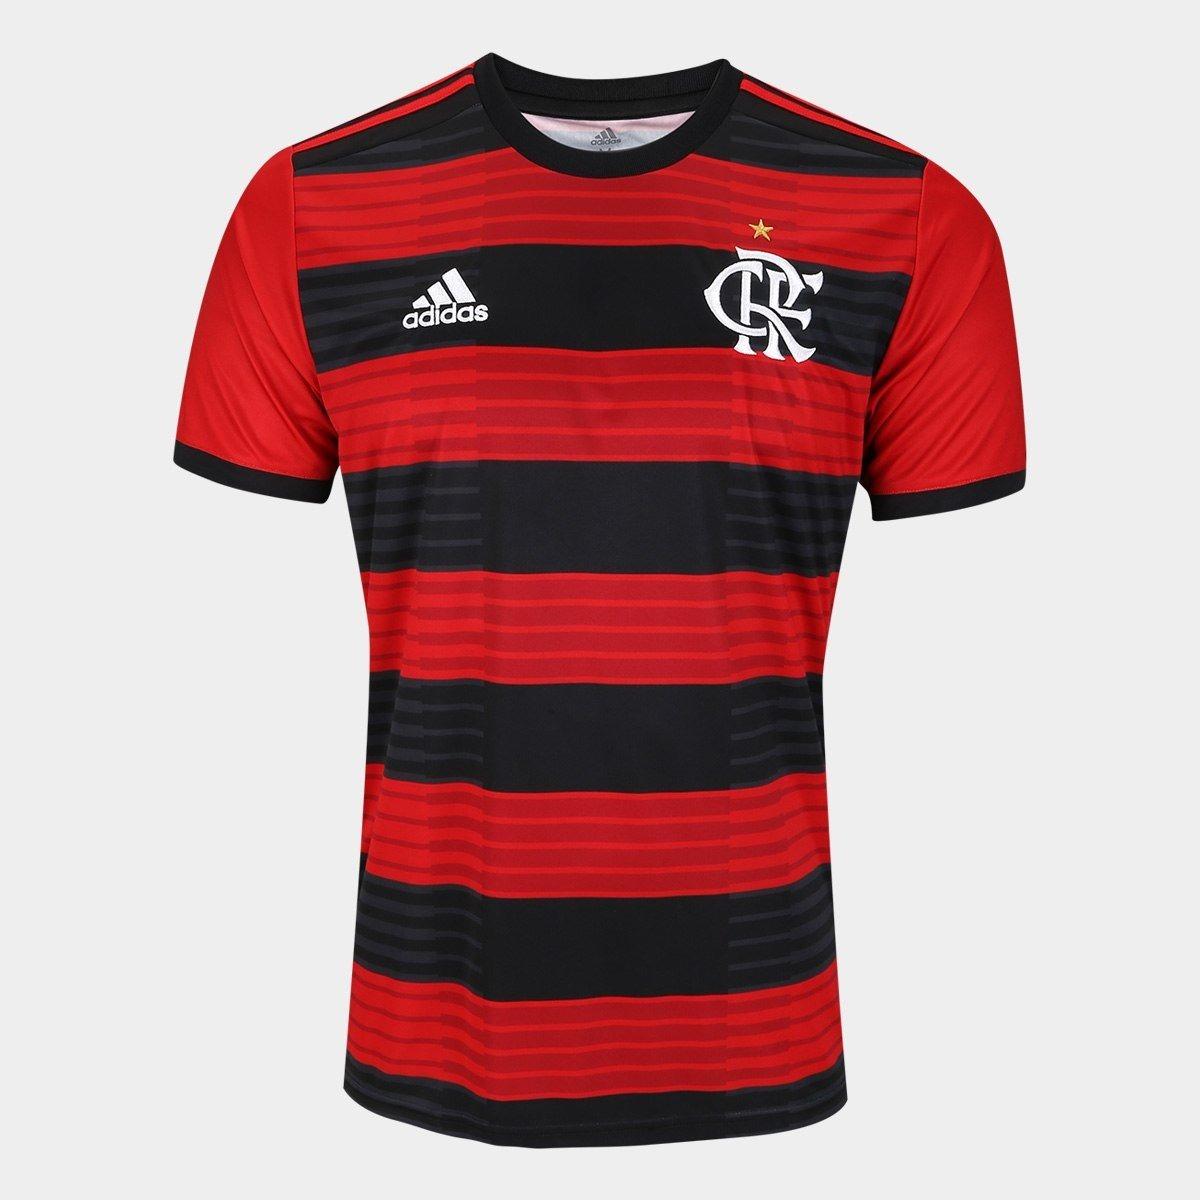 ... nova camisa flamengo original adidas 2018 s nº torcedor casa. Carregando  zoom. c6d7543037b6ab  Camisa Penalty Masculina Futsal Brasil ... 83bc48556e72f